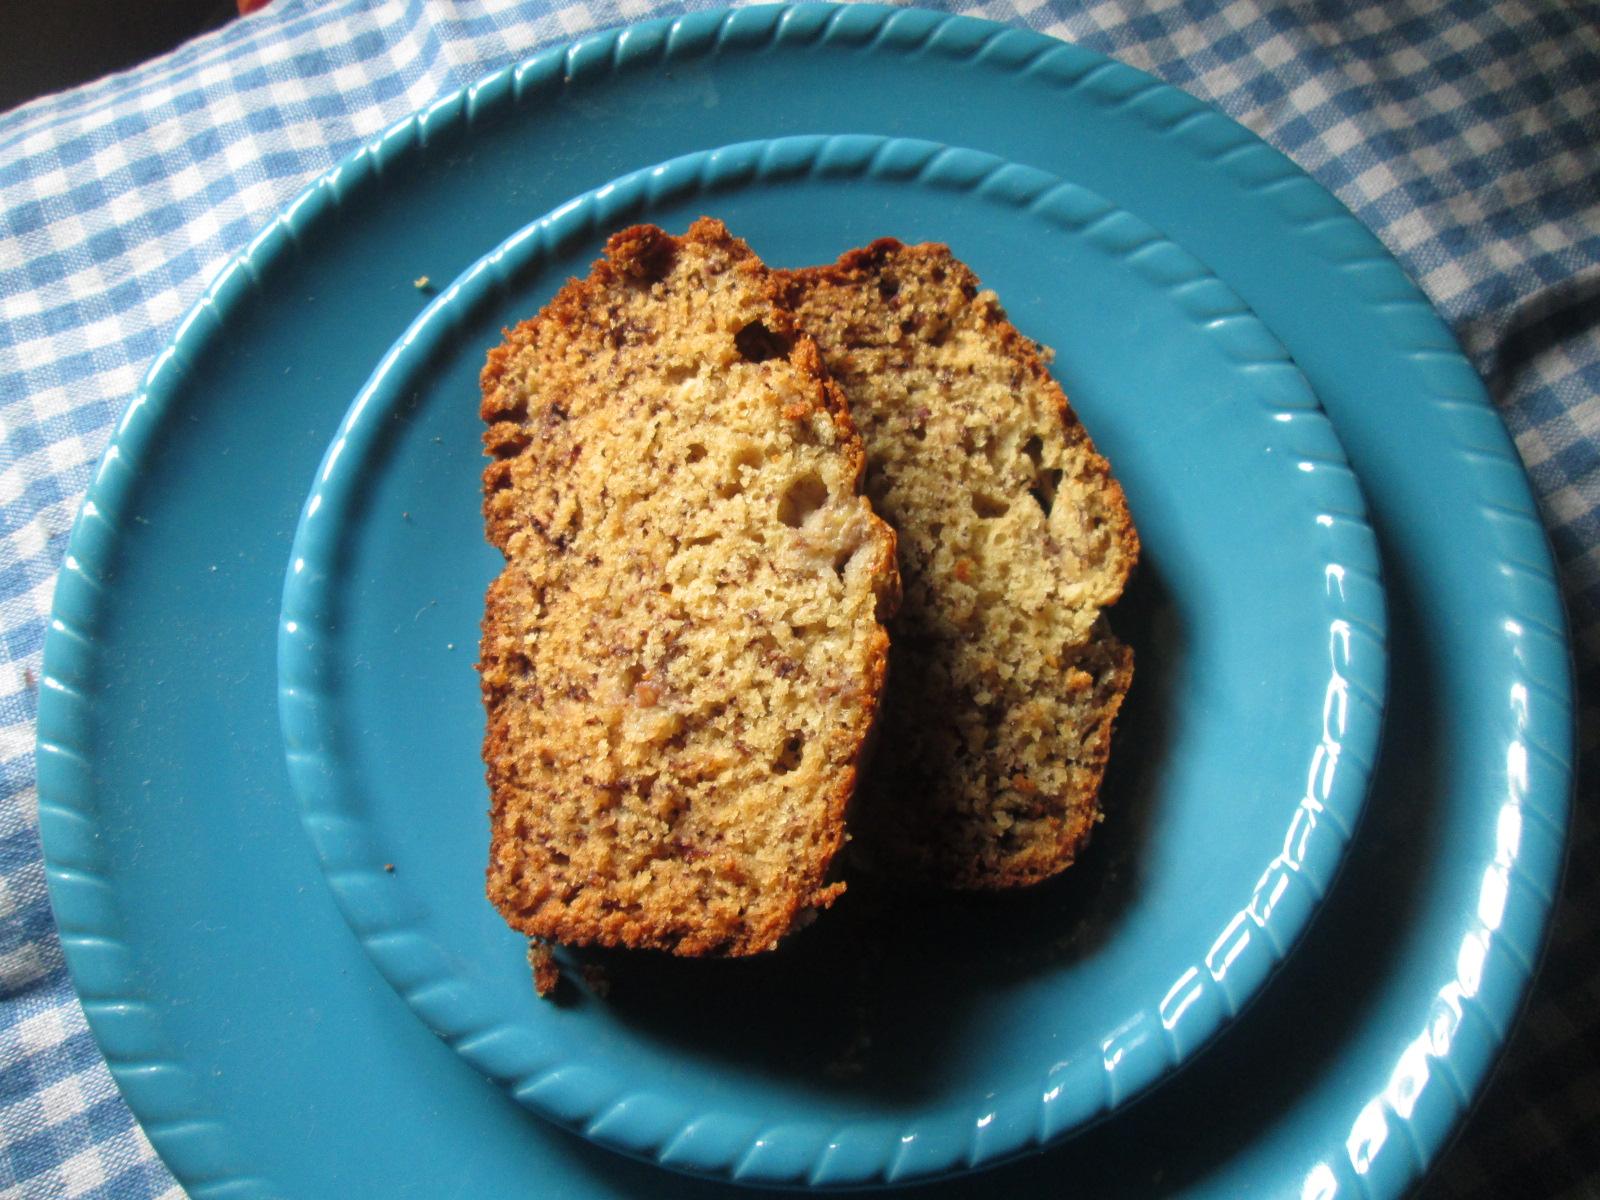 Canela kitchen (gloria): Classic Banana Cake (Cake de platano)